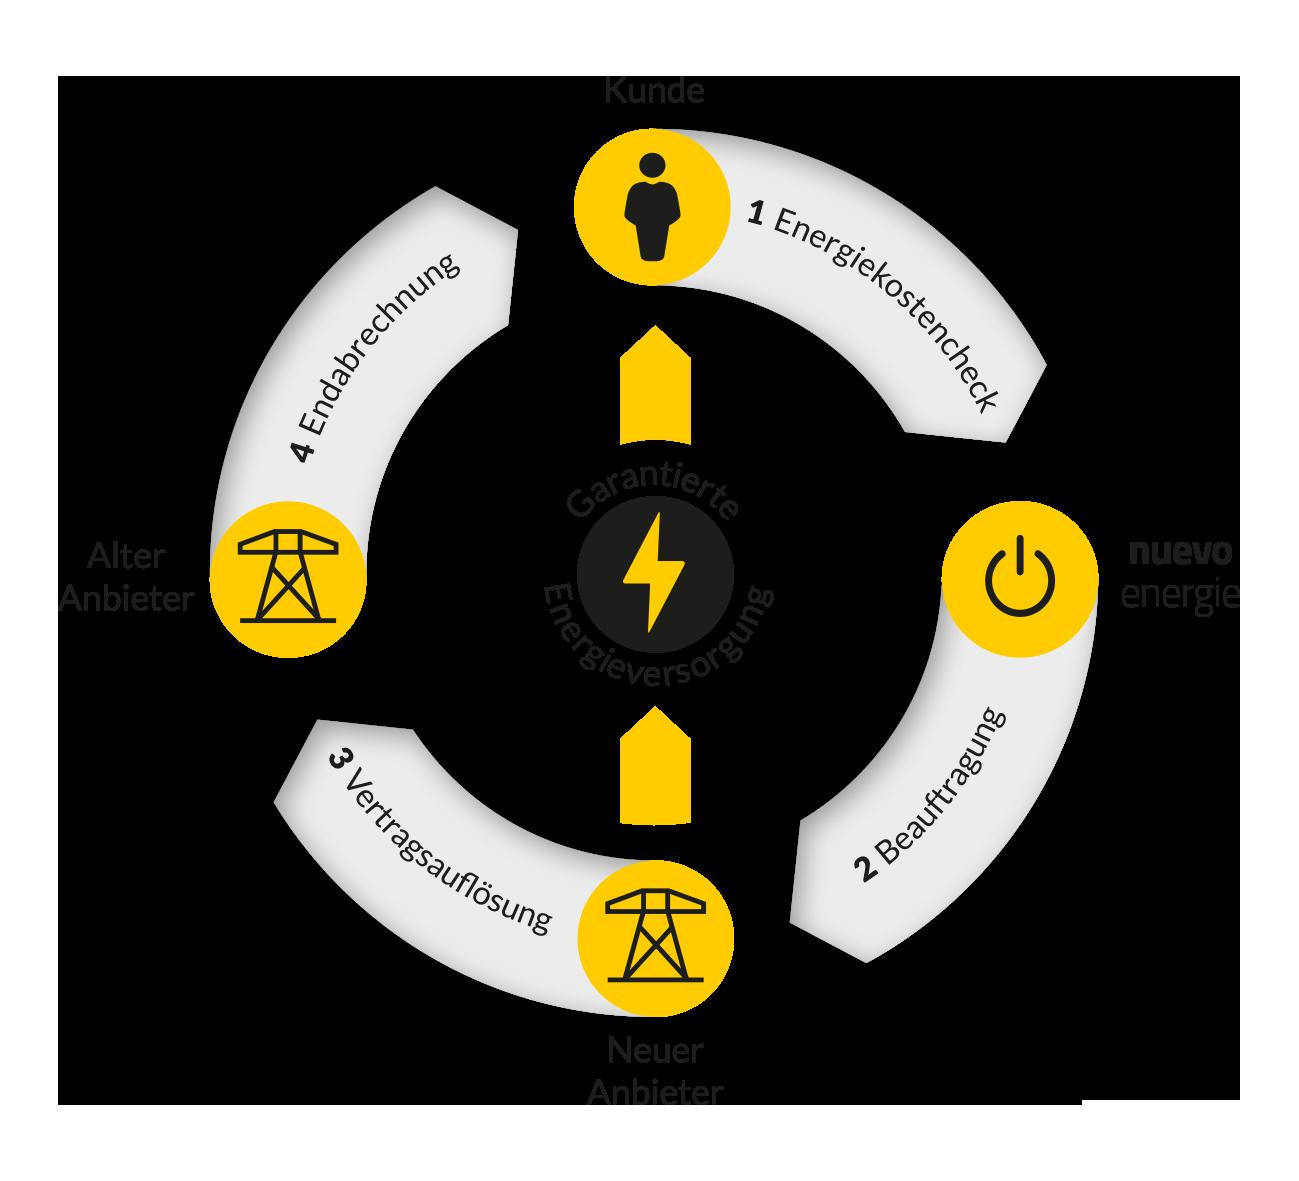 nuevo-energie-makler-anbieterwechsel-wechselgrafik-energiemakler-energieberater-gasanbieter-wechseln-stromanbieter-wechseln-infografik